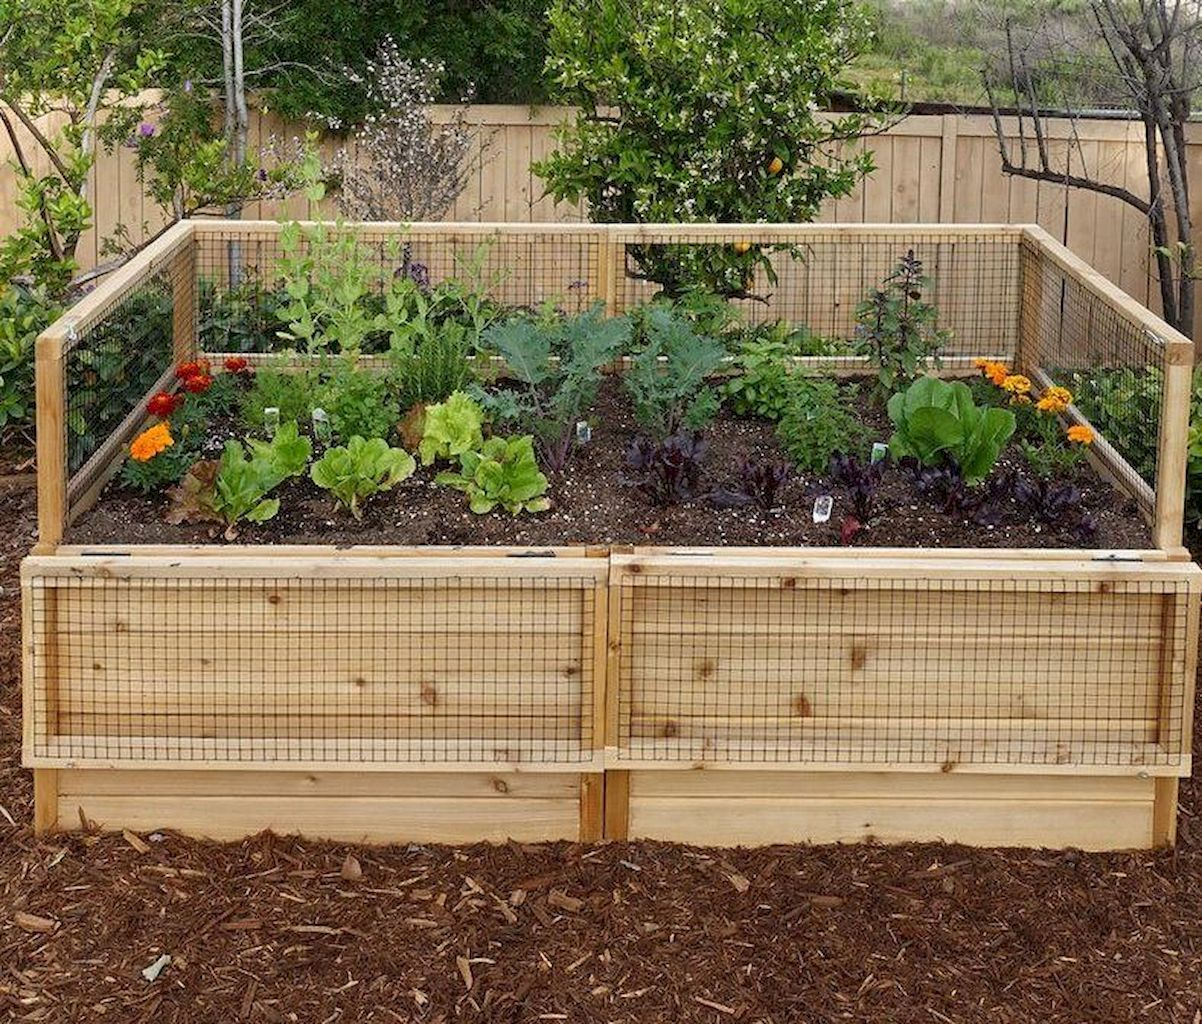 55 Diy Raised Garden Bed Plans Ideas You Can Build Diy Raised Garden Small Backyard Gardens Raised Garden Backyard garden raised bed plans